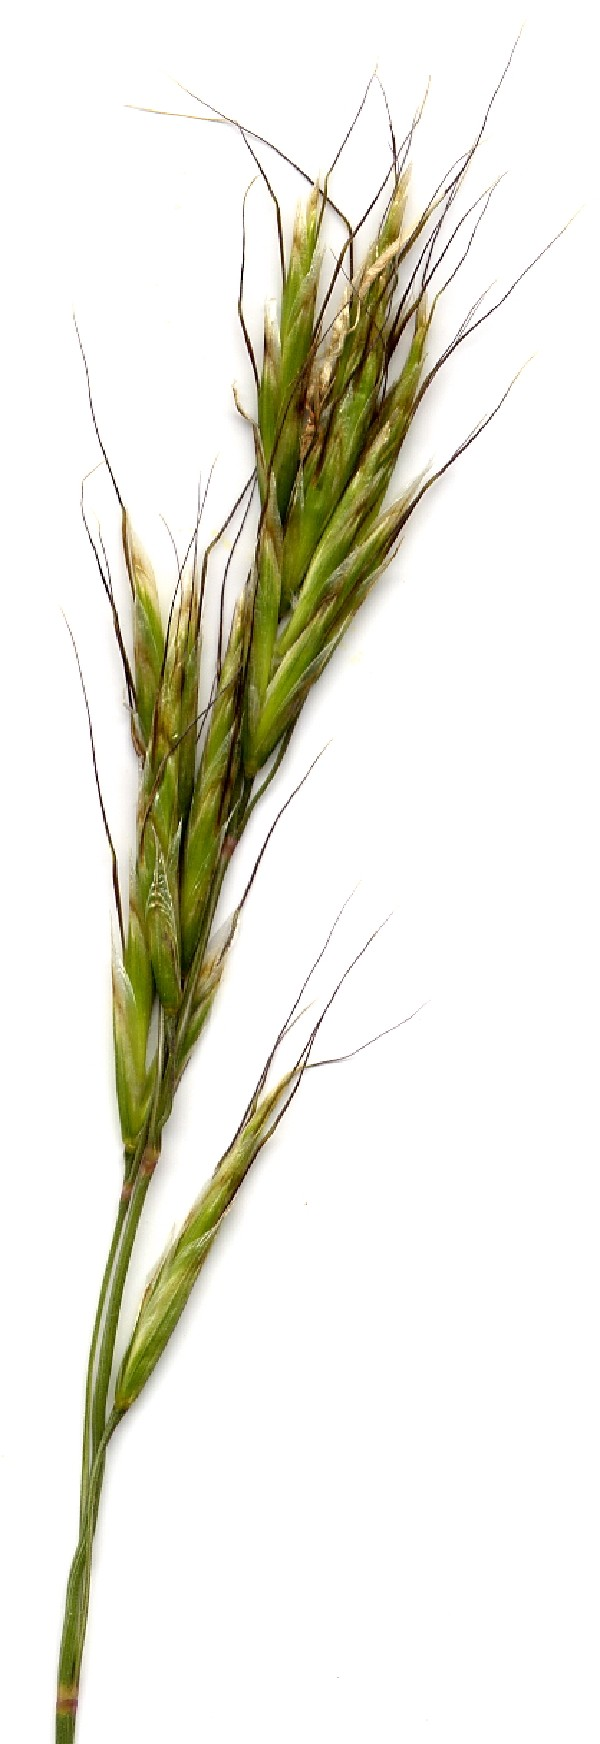 Helictotrichon pratense 3